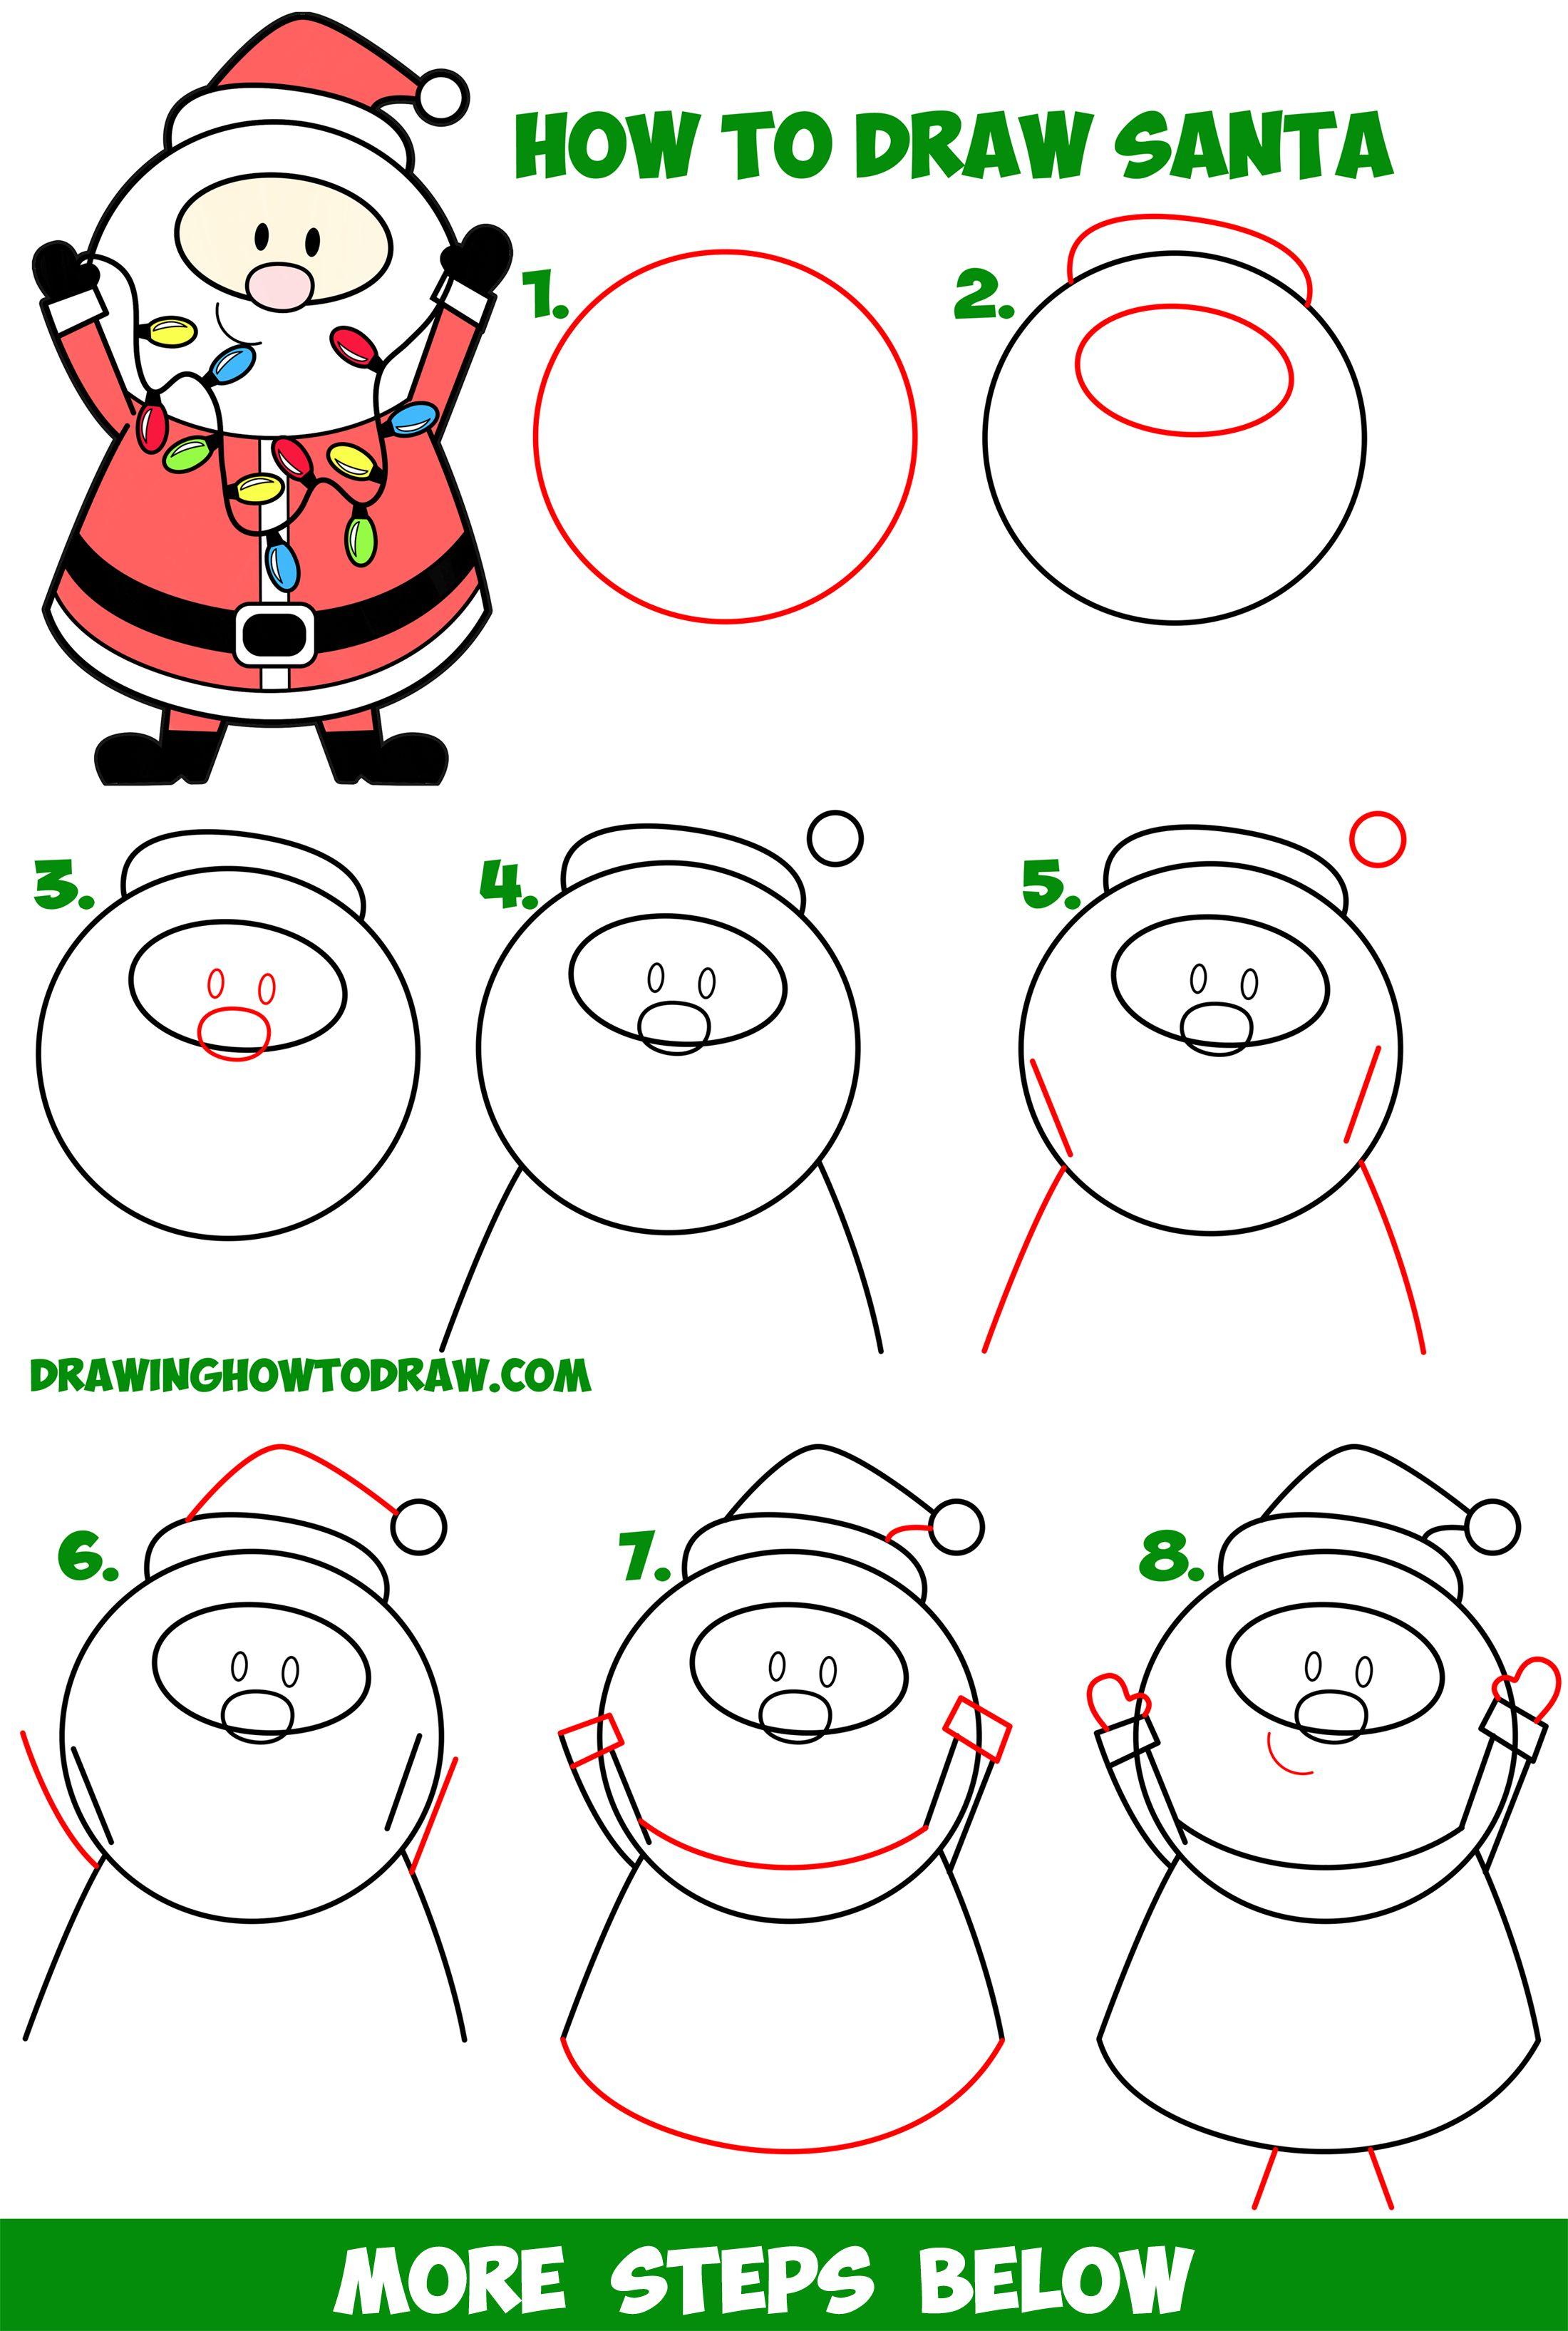 HOW TO DRAW Santa? Christmas drawing, How to draw santa